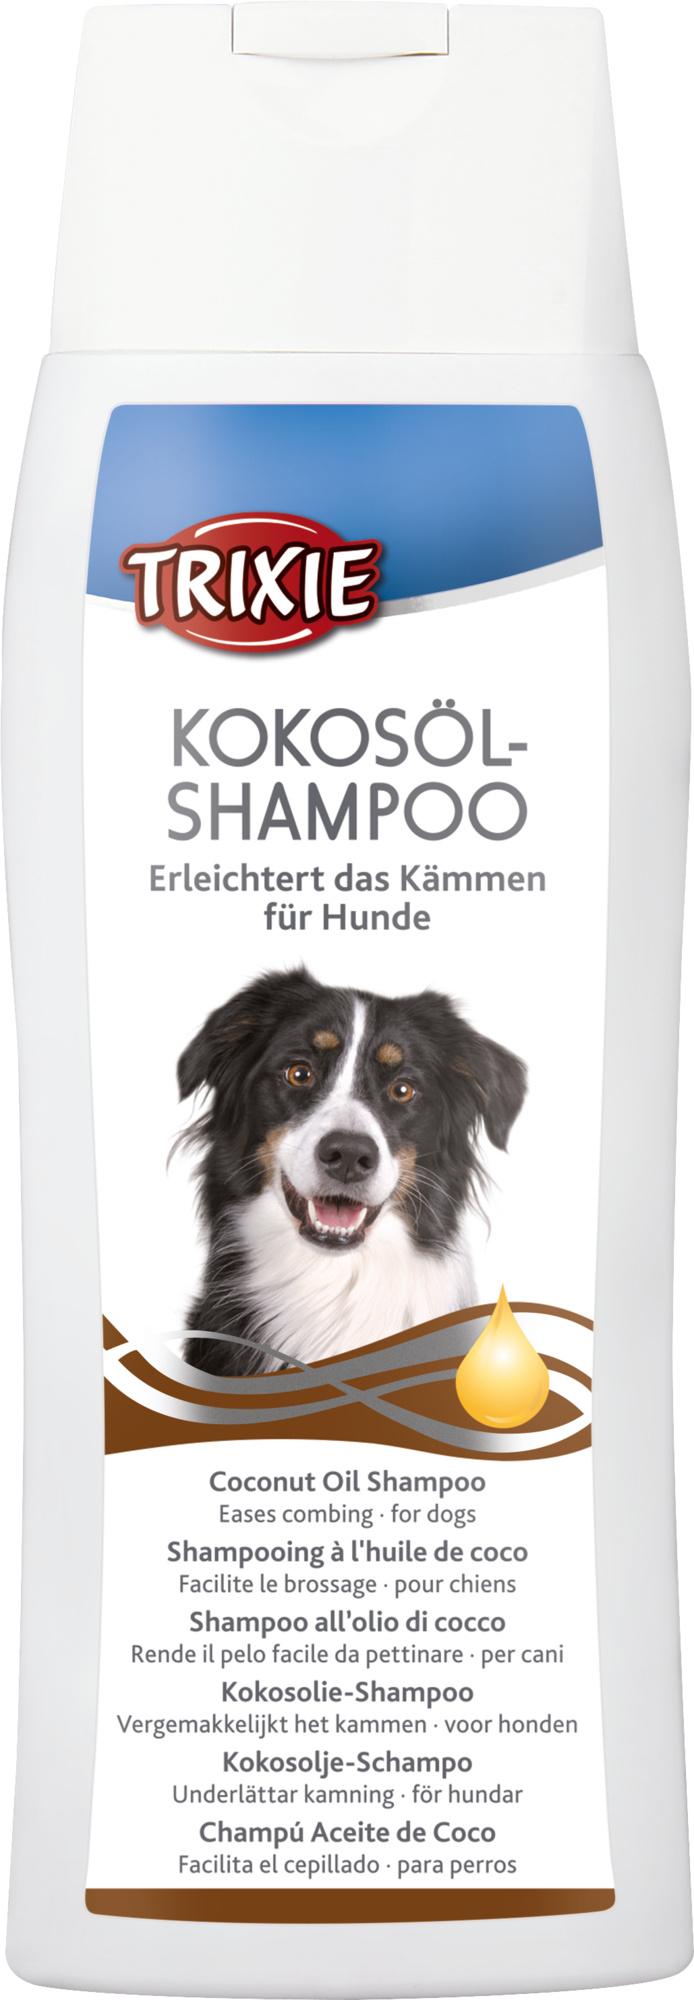 Kokosöl-Shampoo